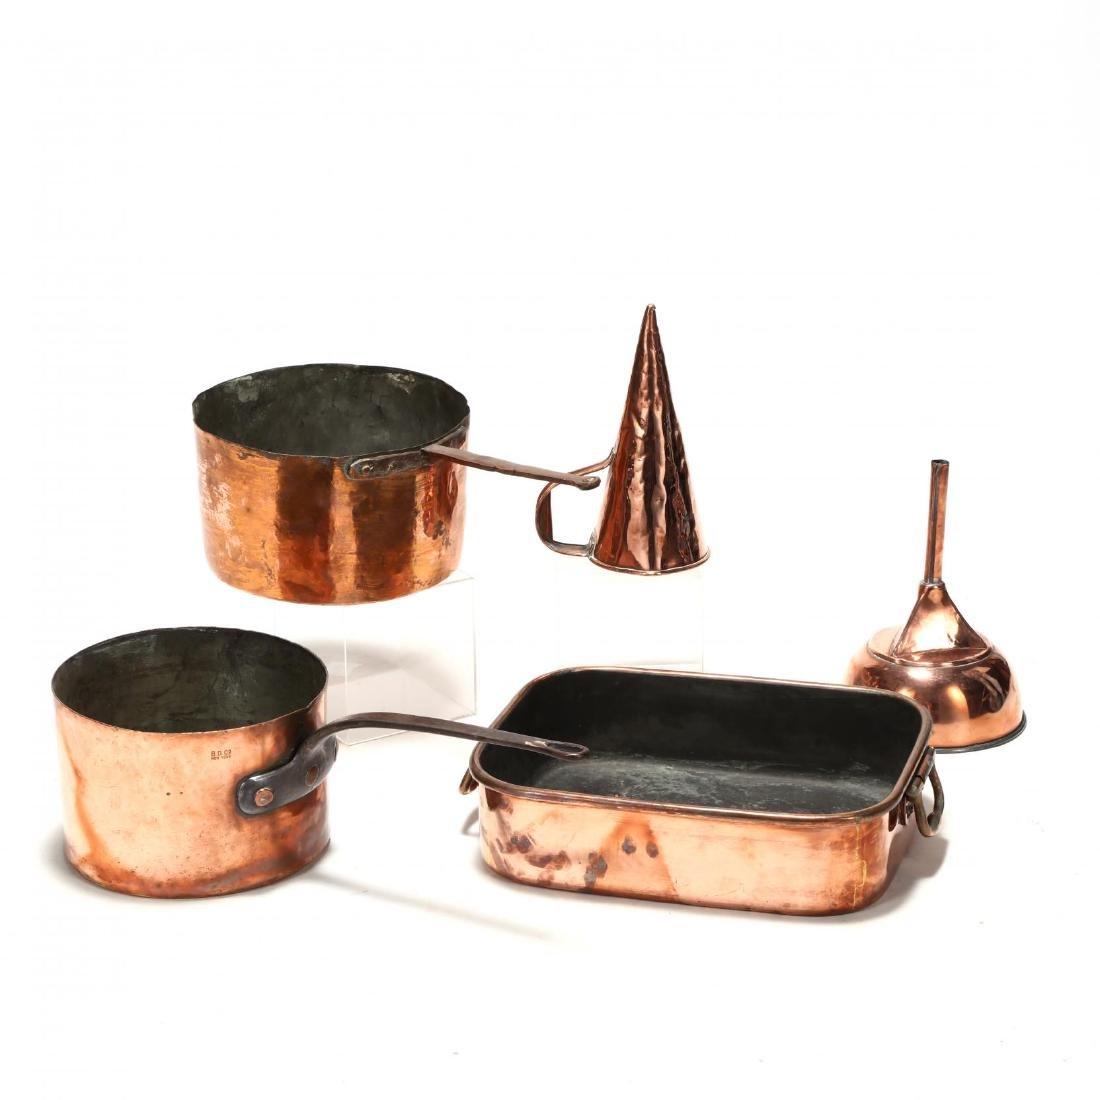 Five Antique Copper Kitchen Accessories - 2